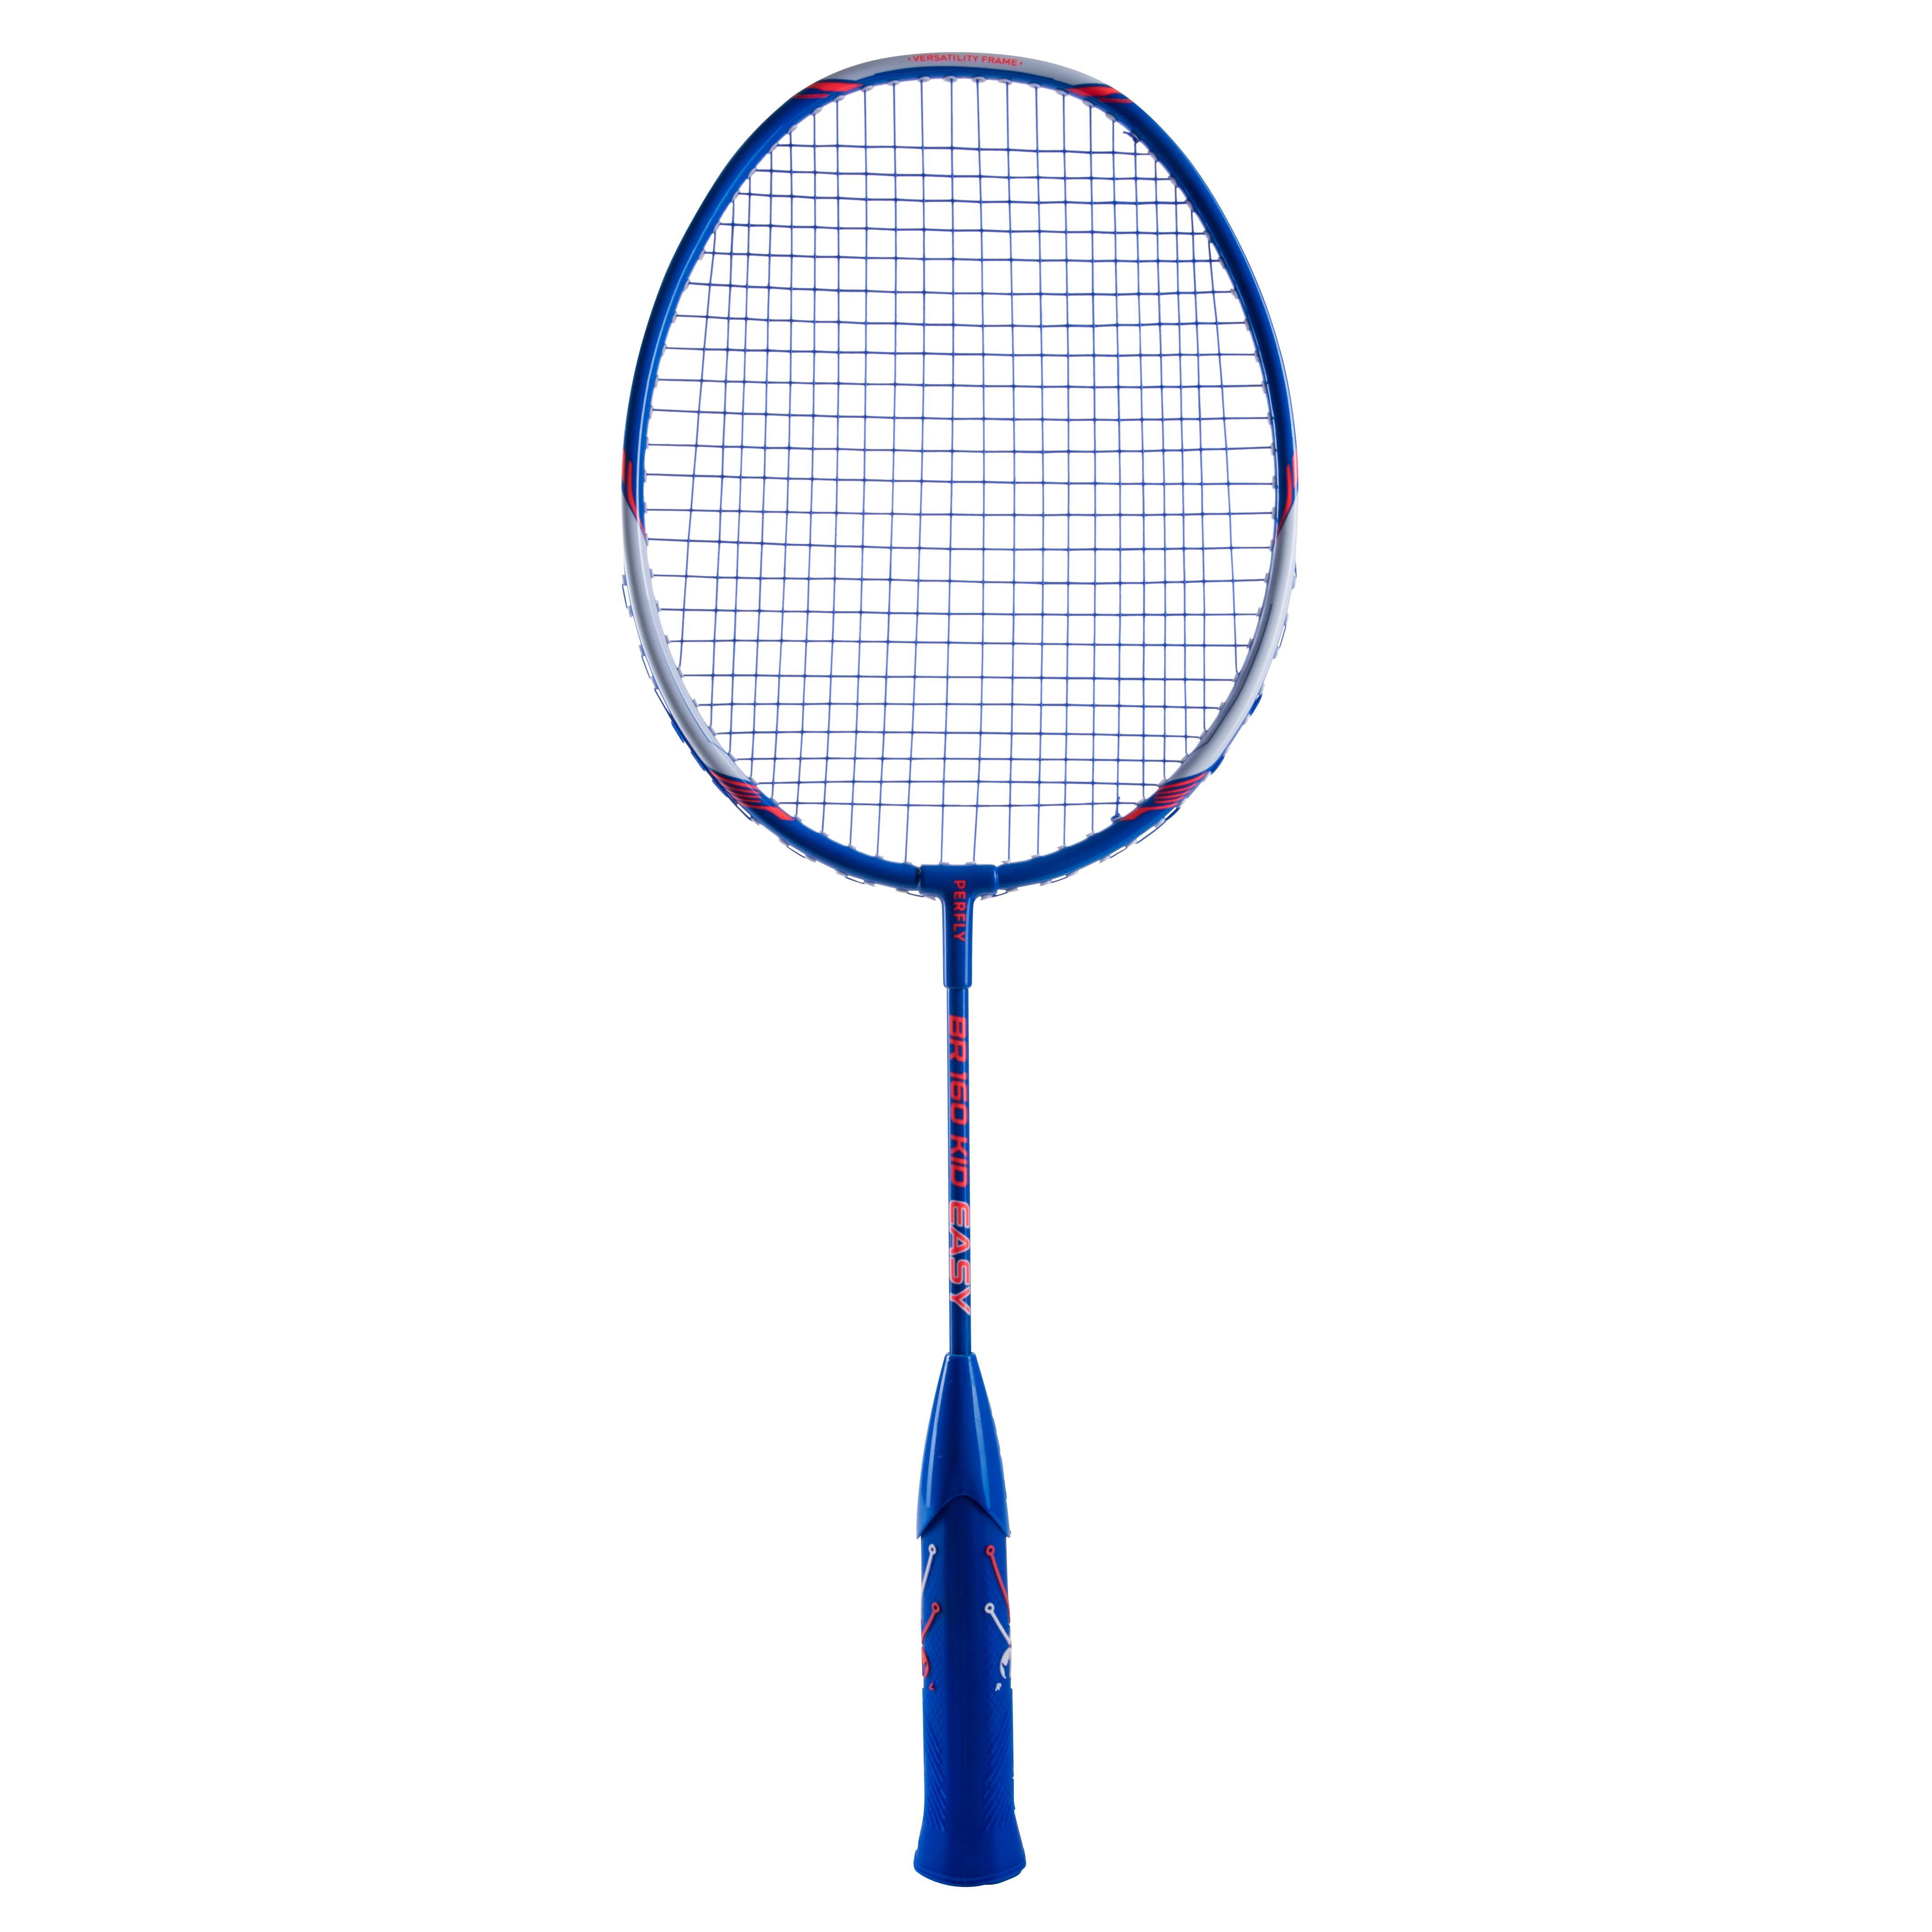 Rachetă Badminton BR160 la Reducere poza